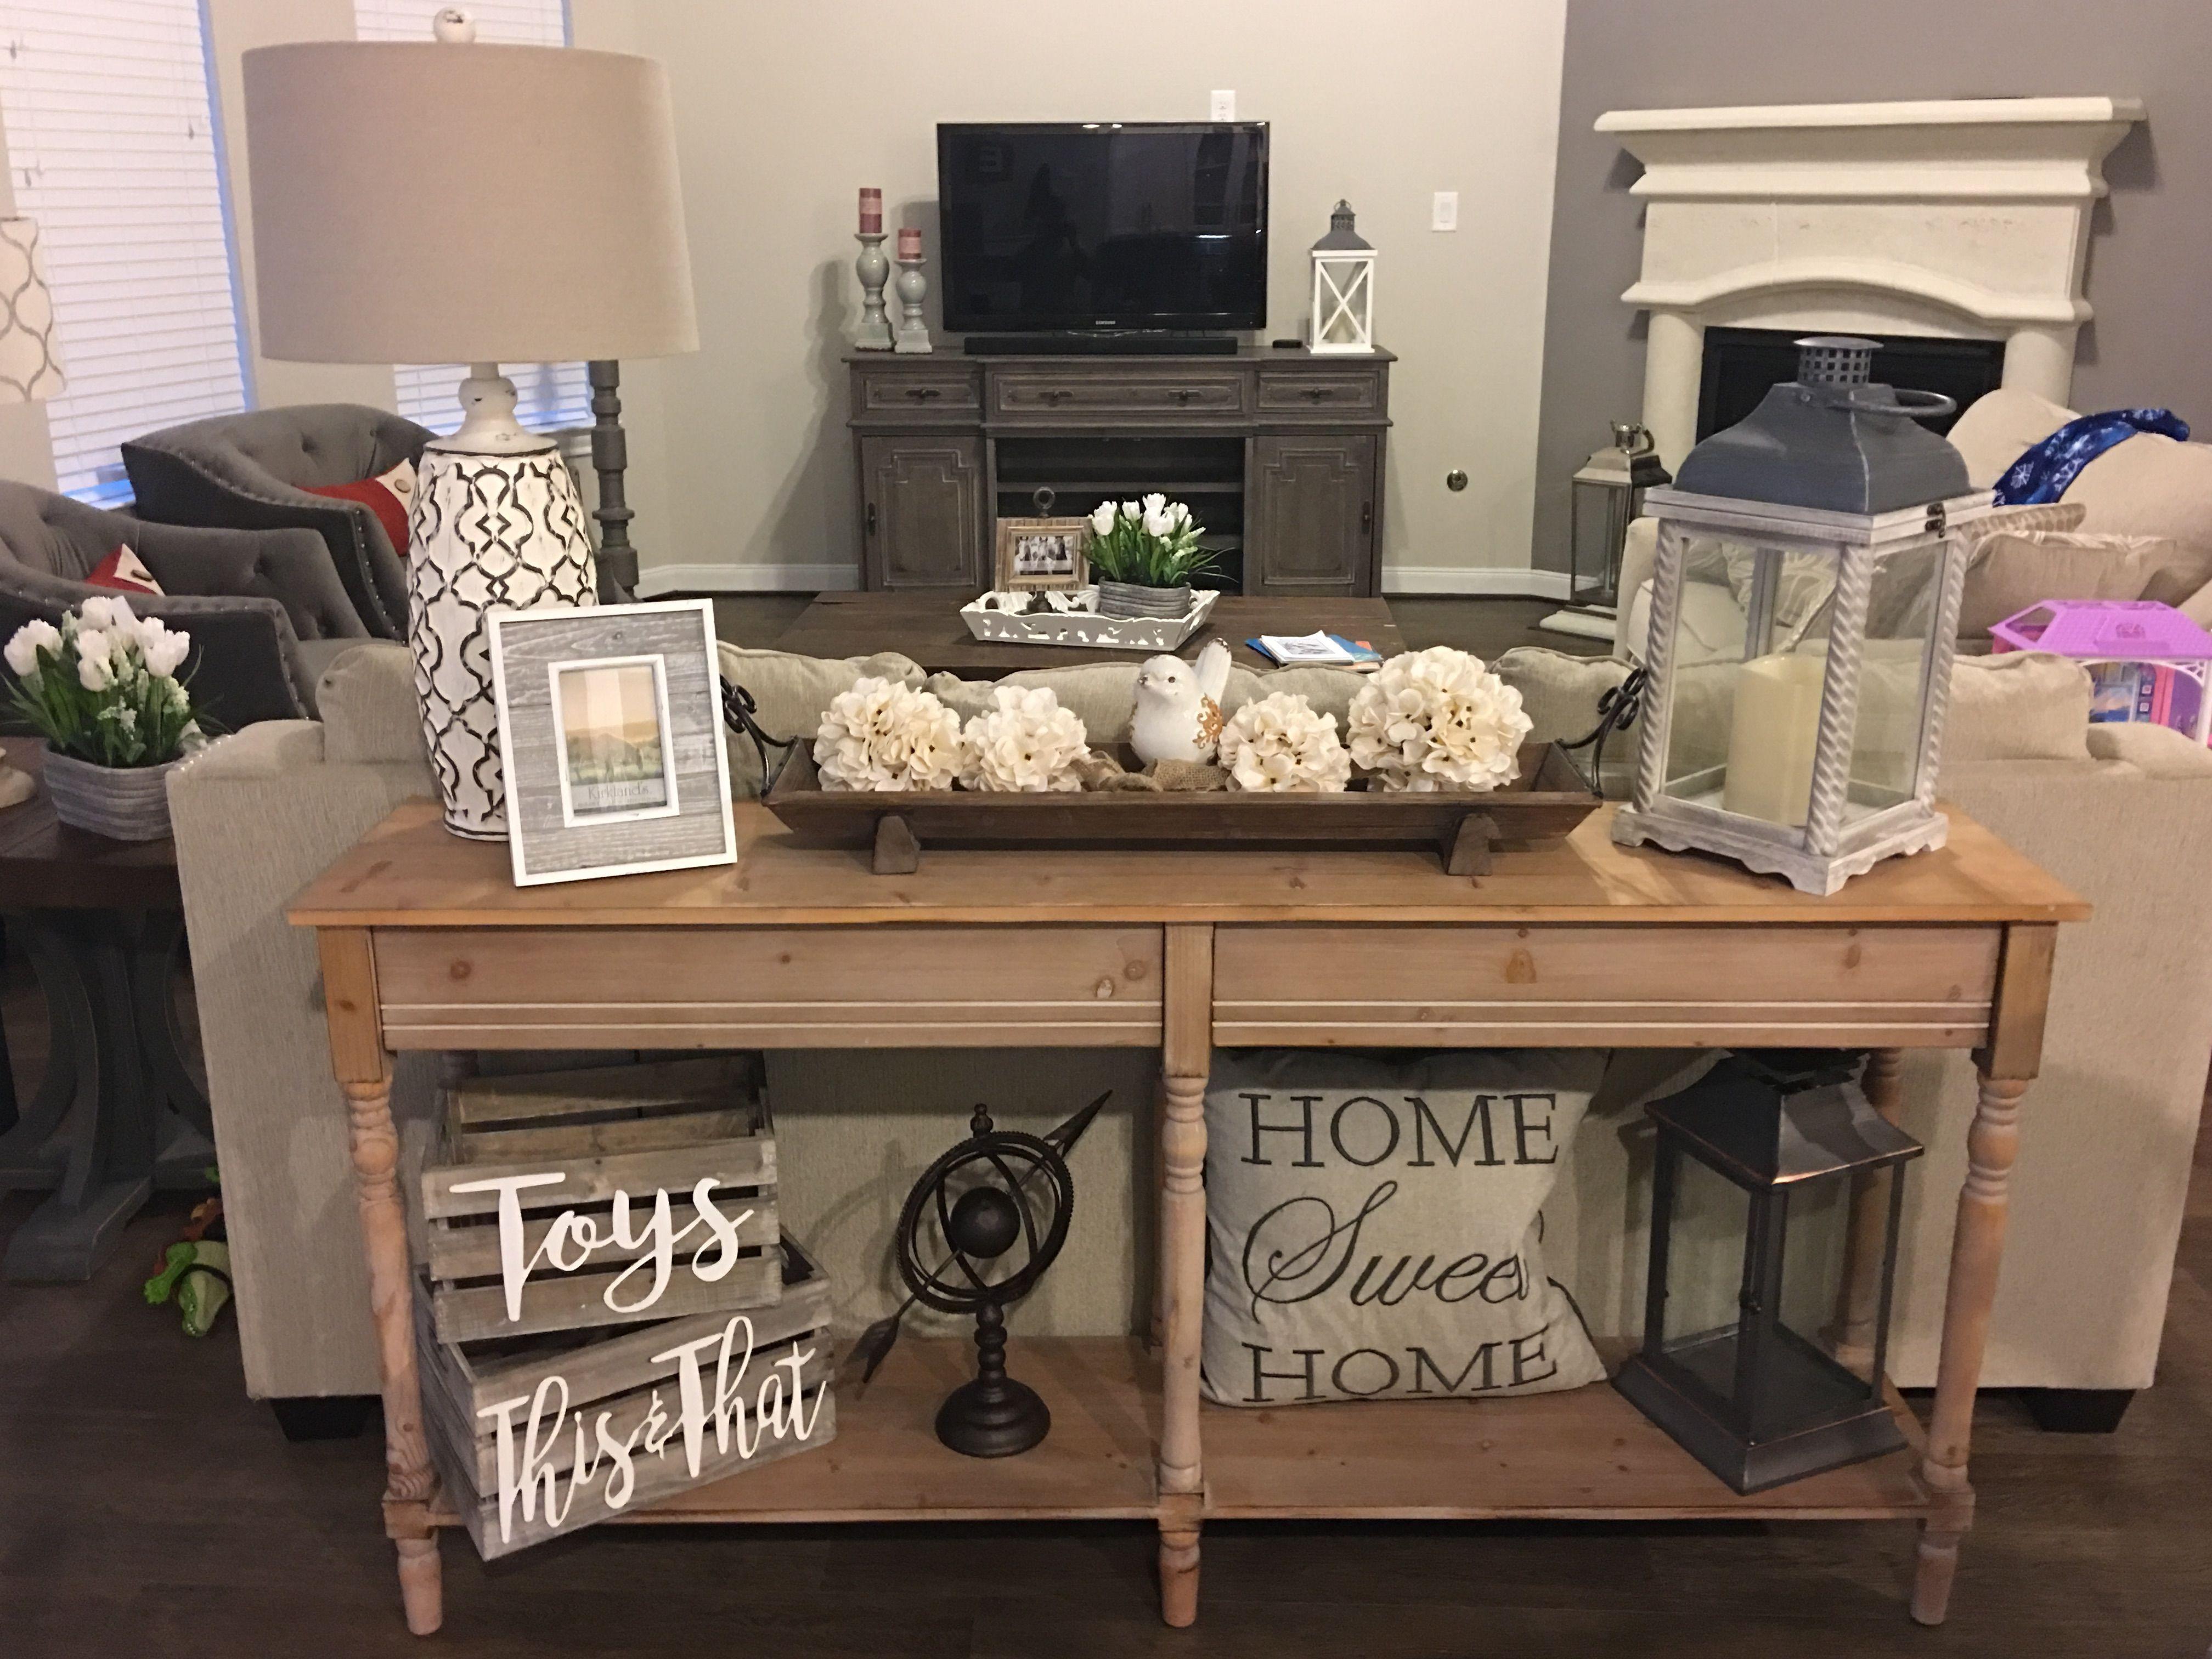 40 Gorgoeus Farmhouse Console Table Design Ideas In 2020 Table Decor Living Room Sofa Table Decor Couch Decor